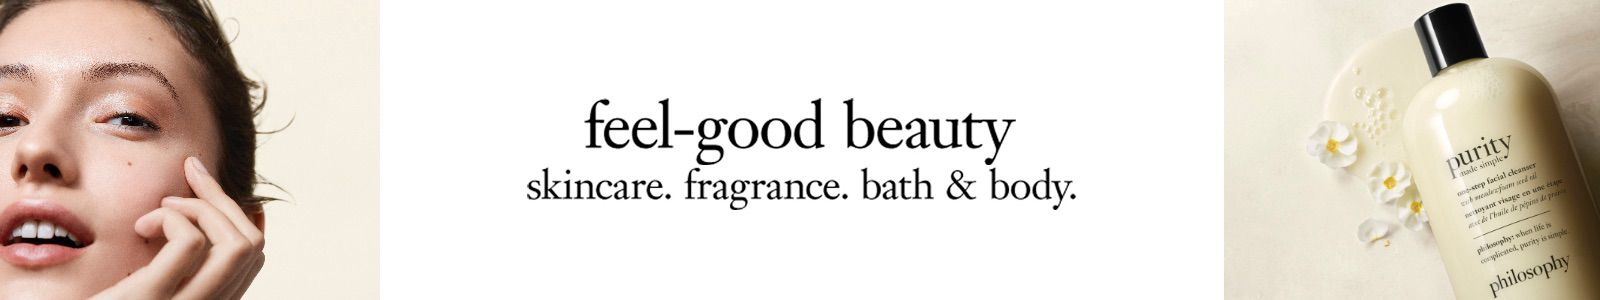 Feel-good beauty, skincare, fragrance. bath and body